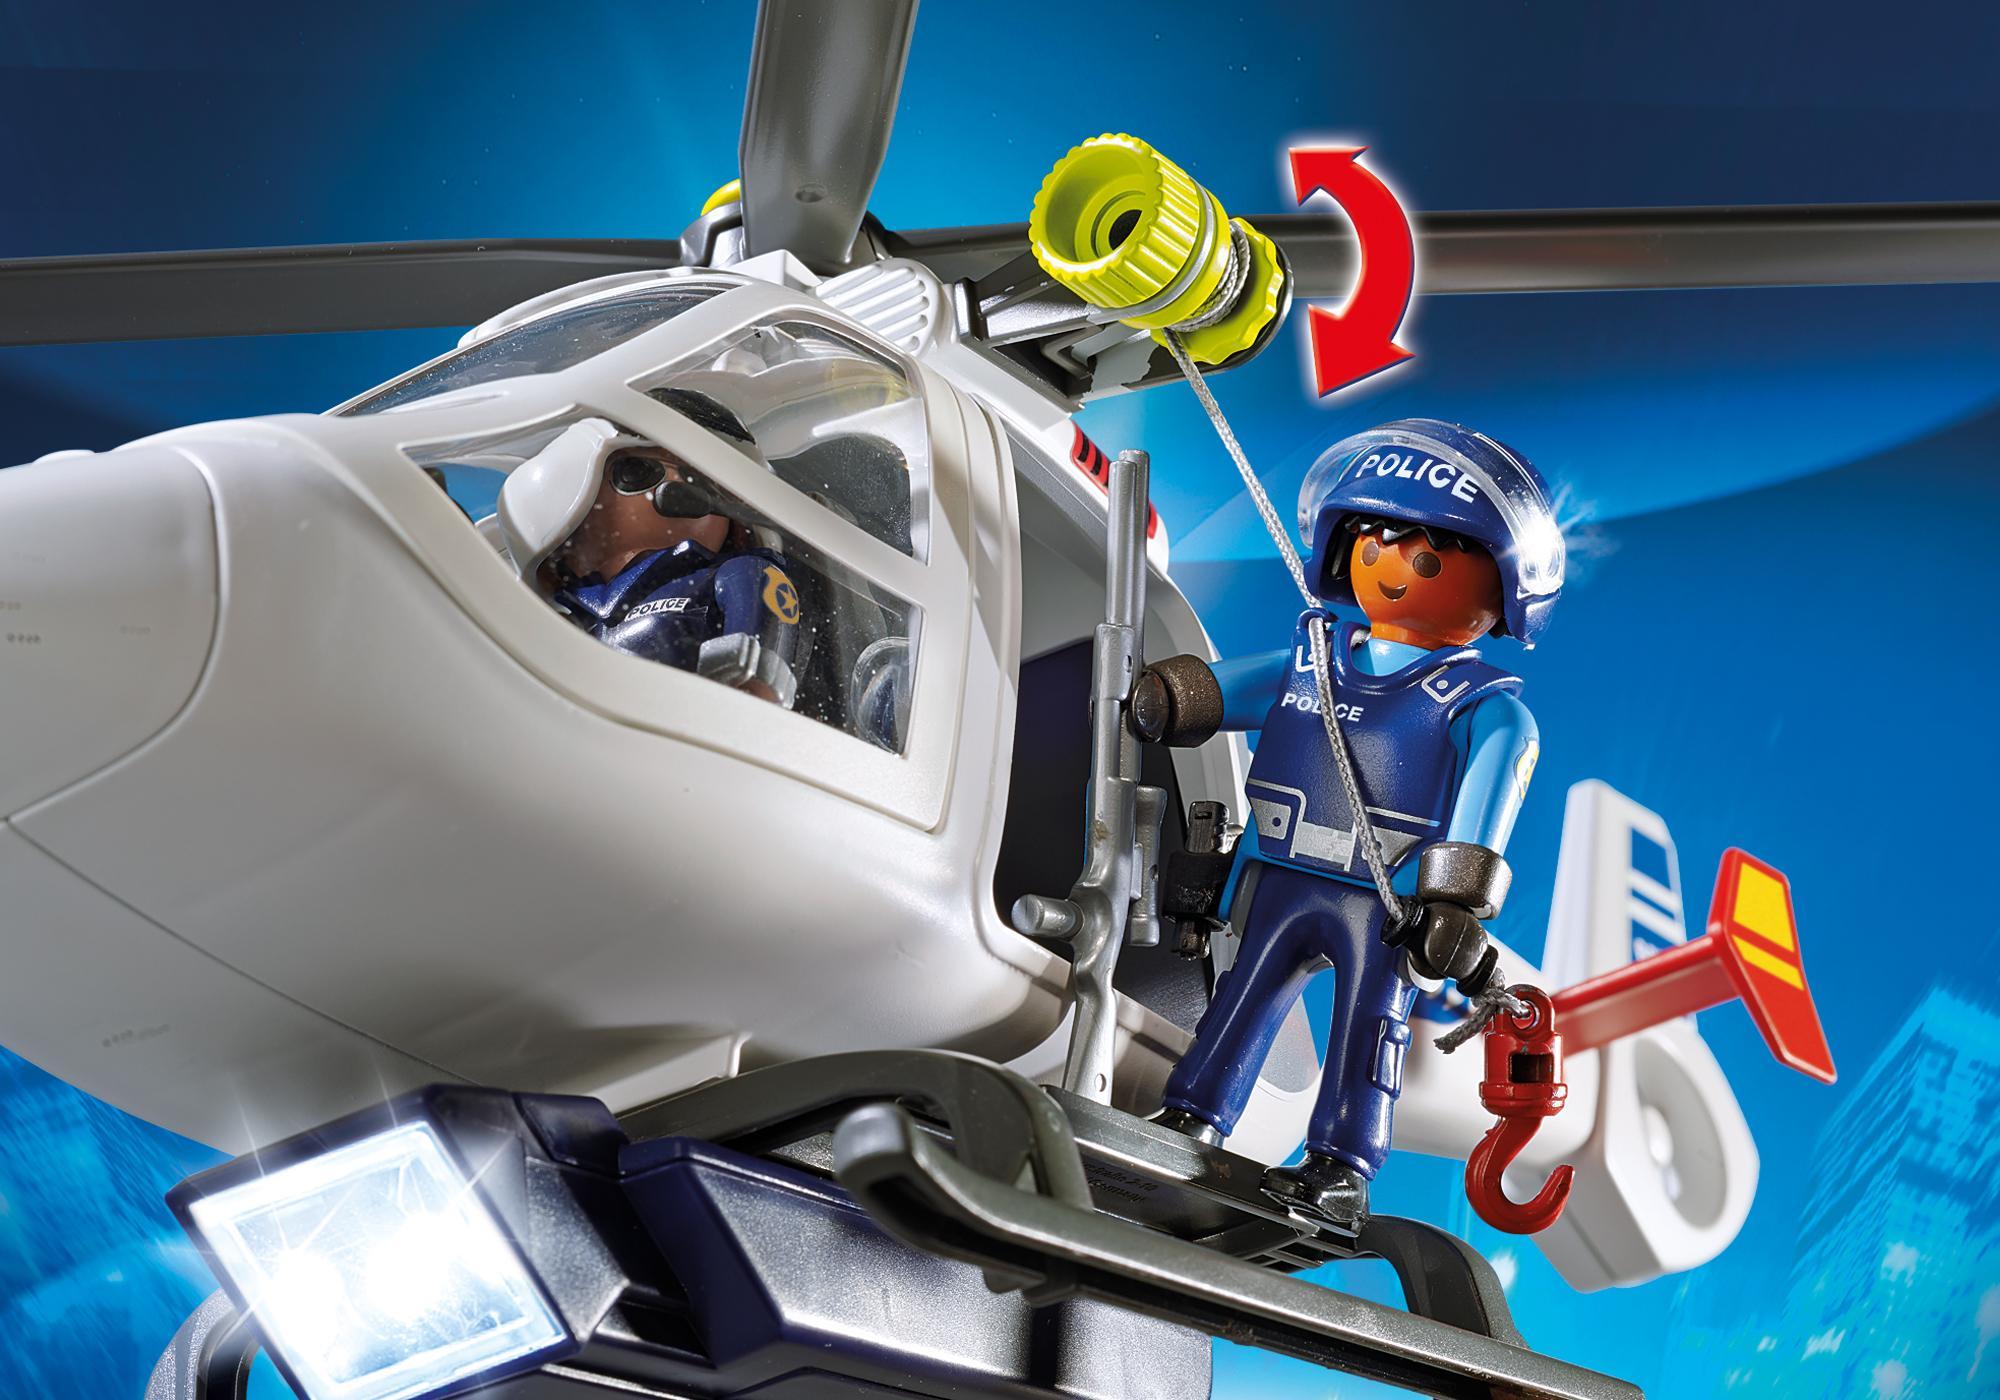 http://media.playmobil.com/i/playmobil/6921_product_extra2/Politiehelikopter met LED-zoeklicht